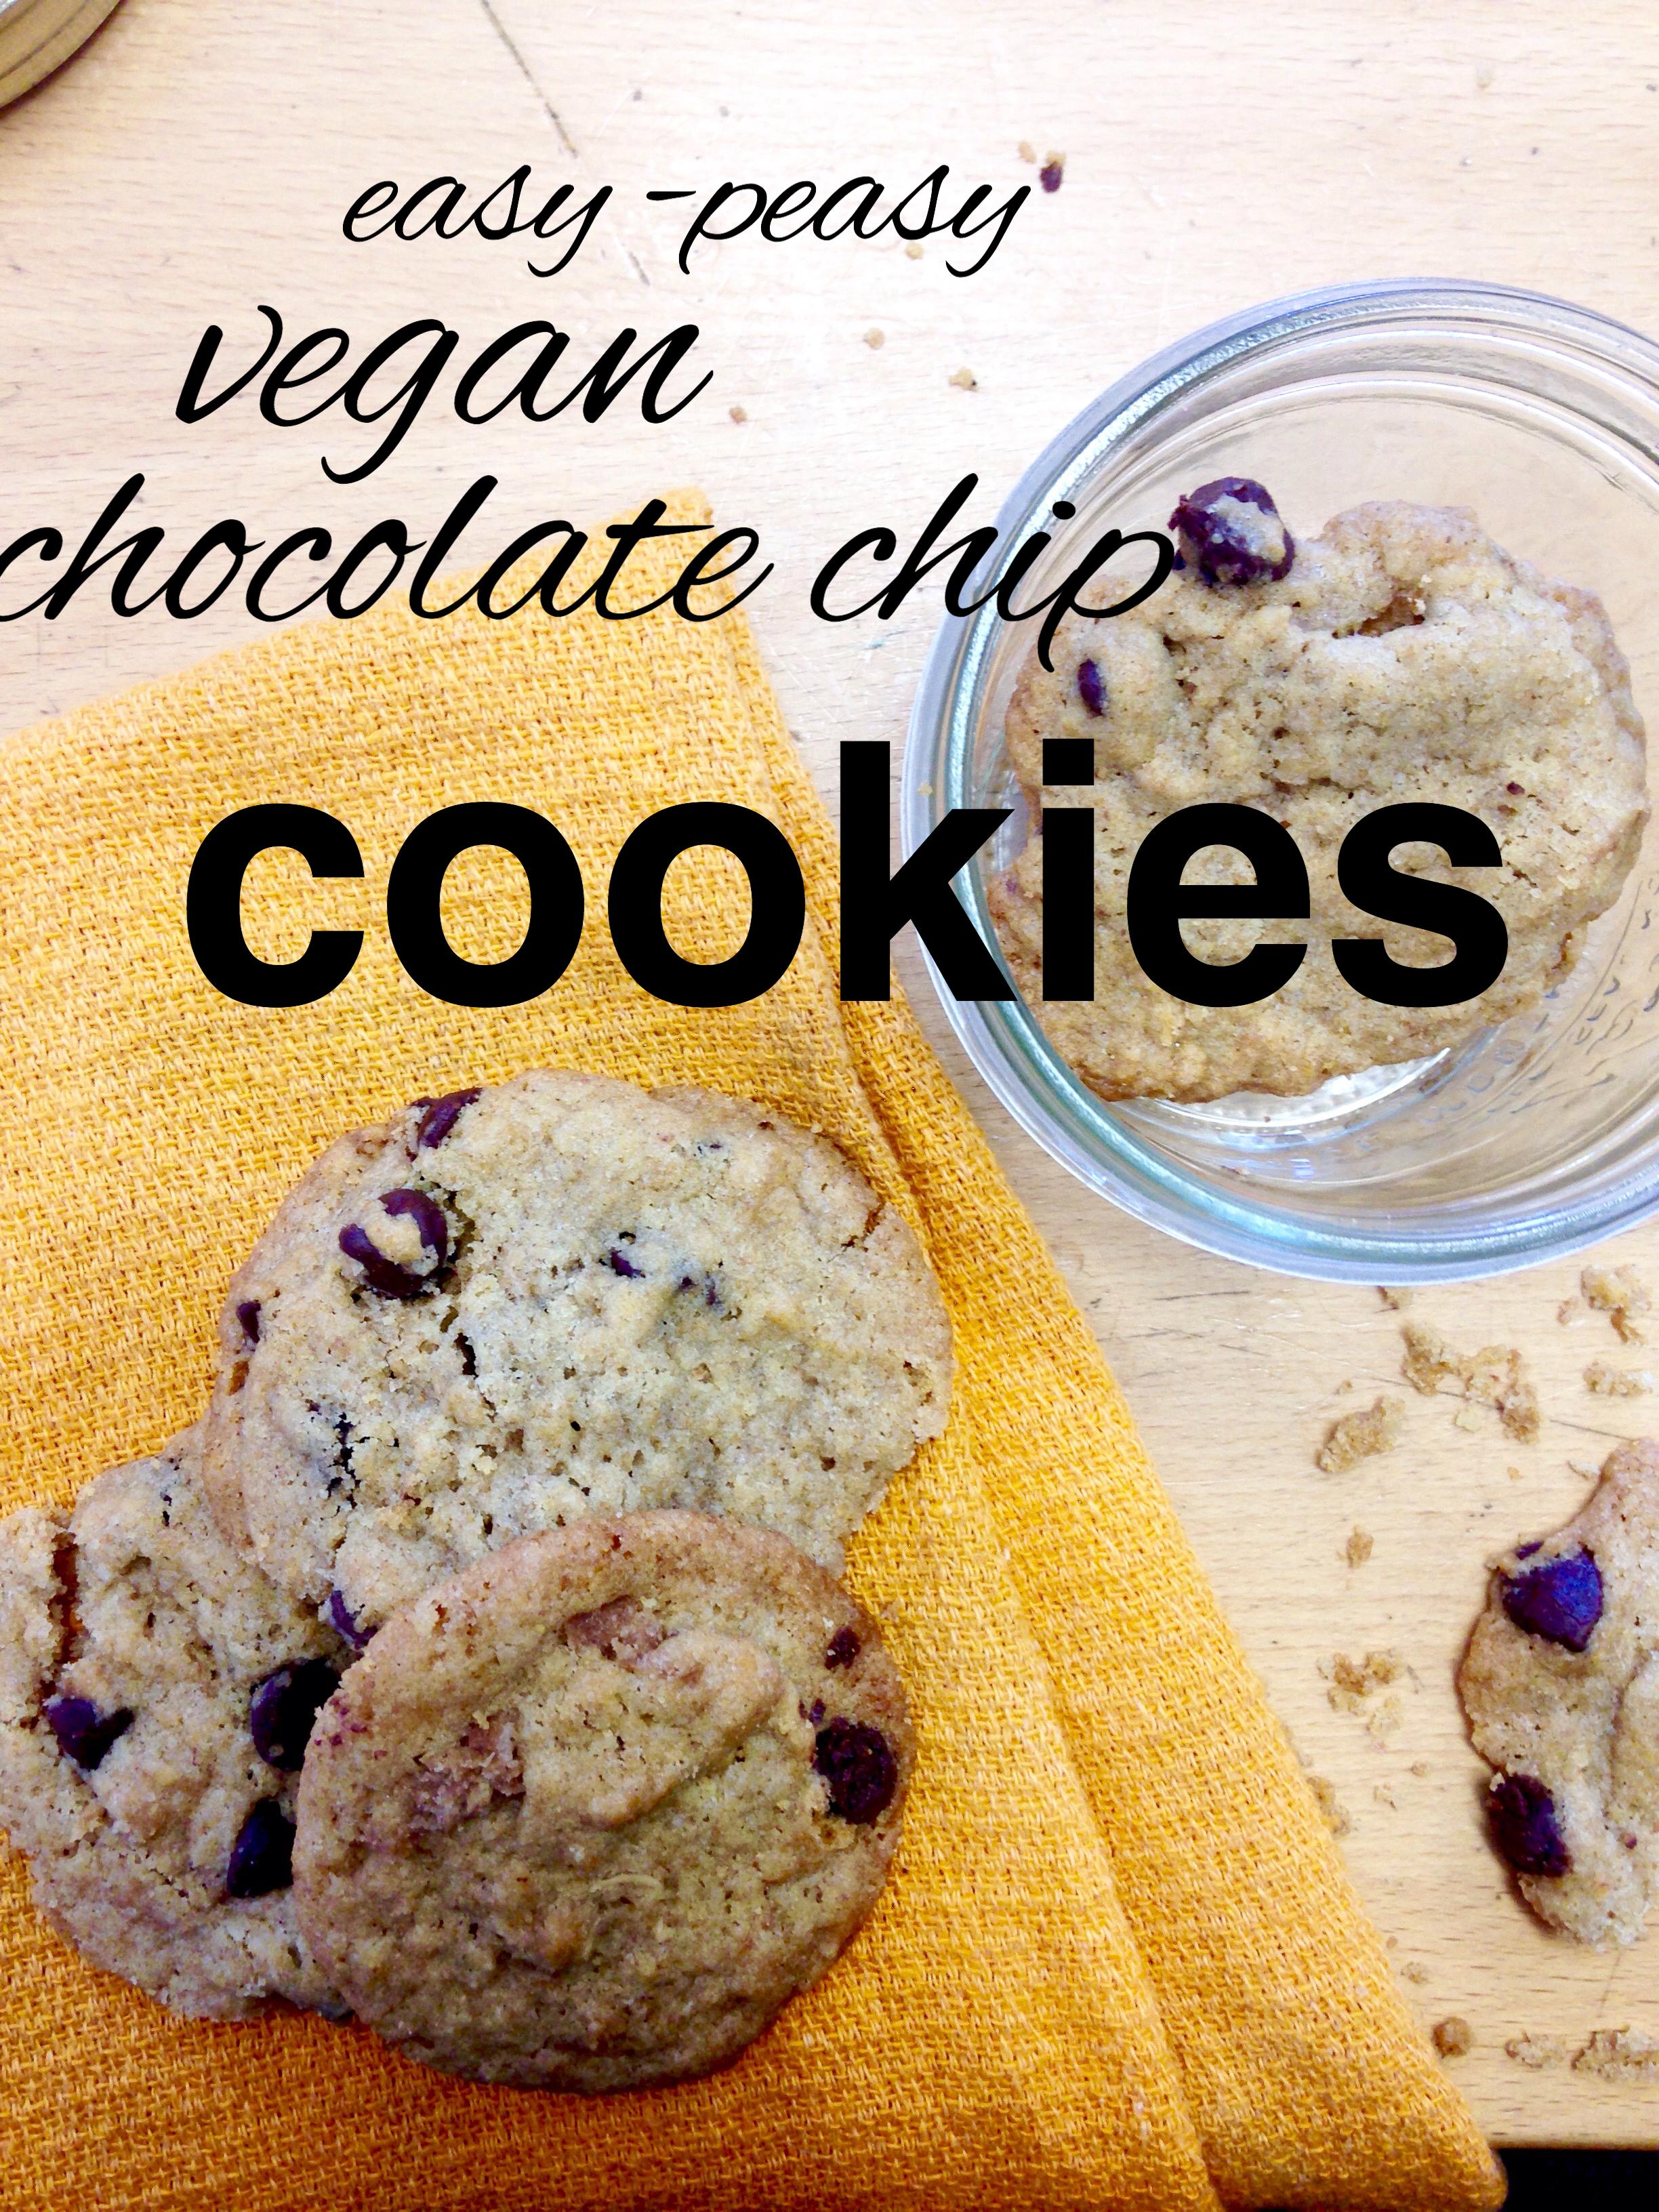 Vegan, zero waste, chocolate chip cookies from www.goingzerowaste.com